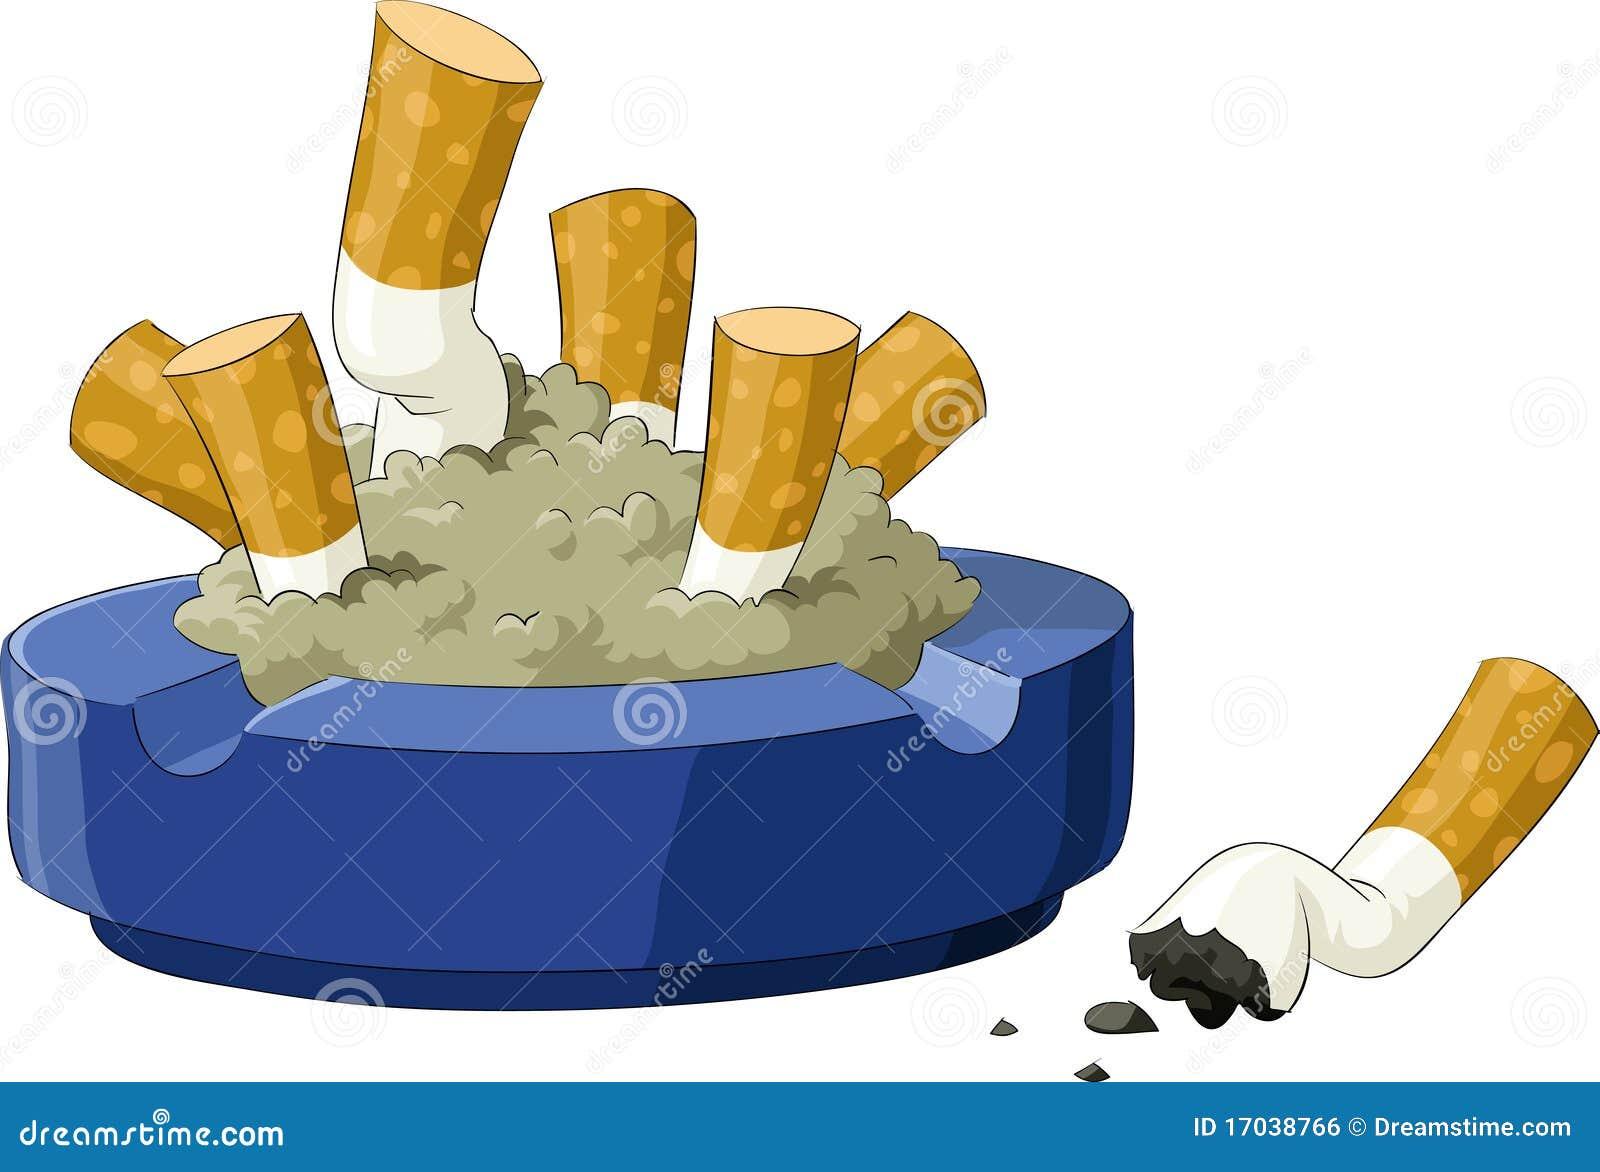 ashtray royalty free stock image image 17038766 potion clipart poison clipart gif